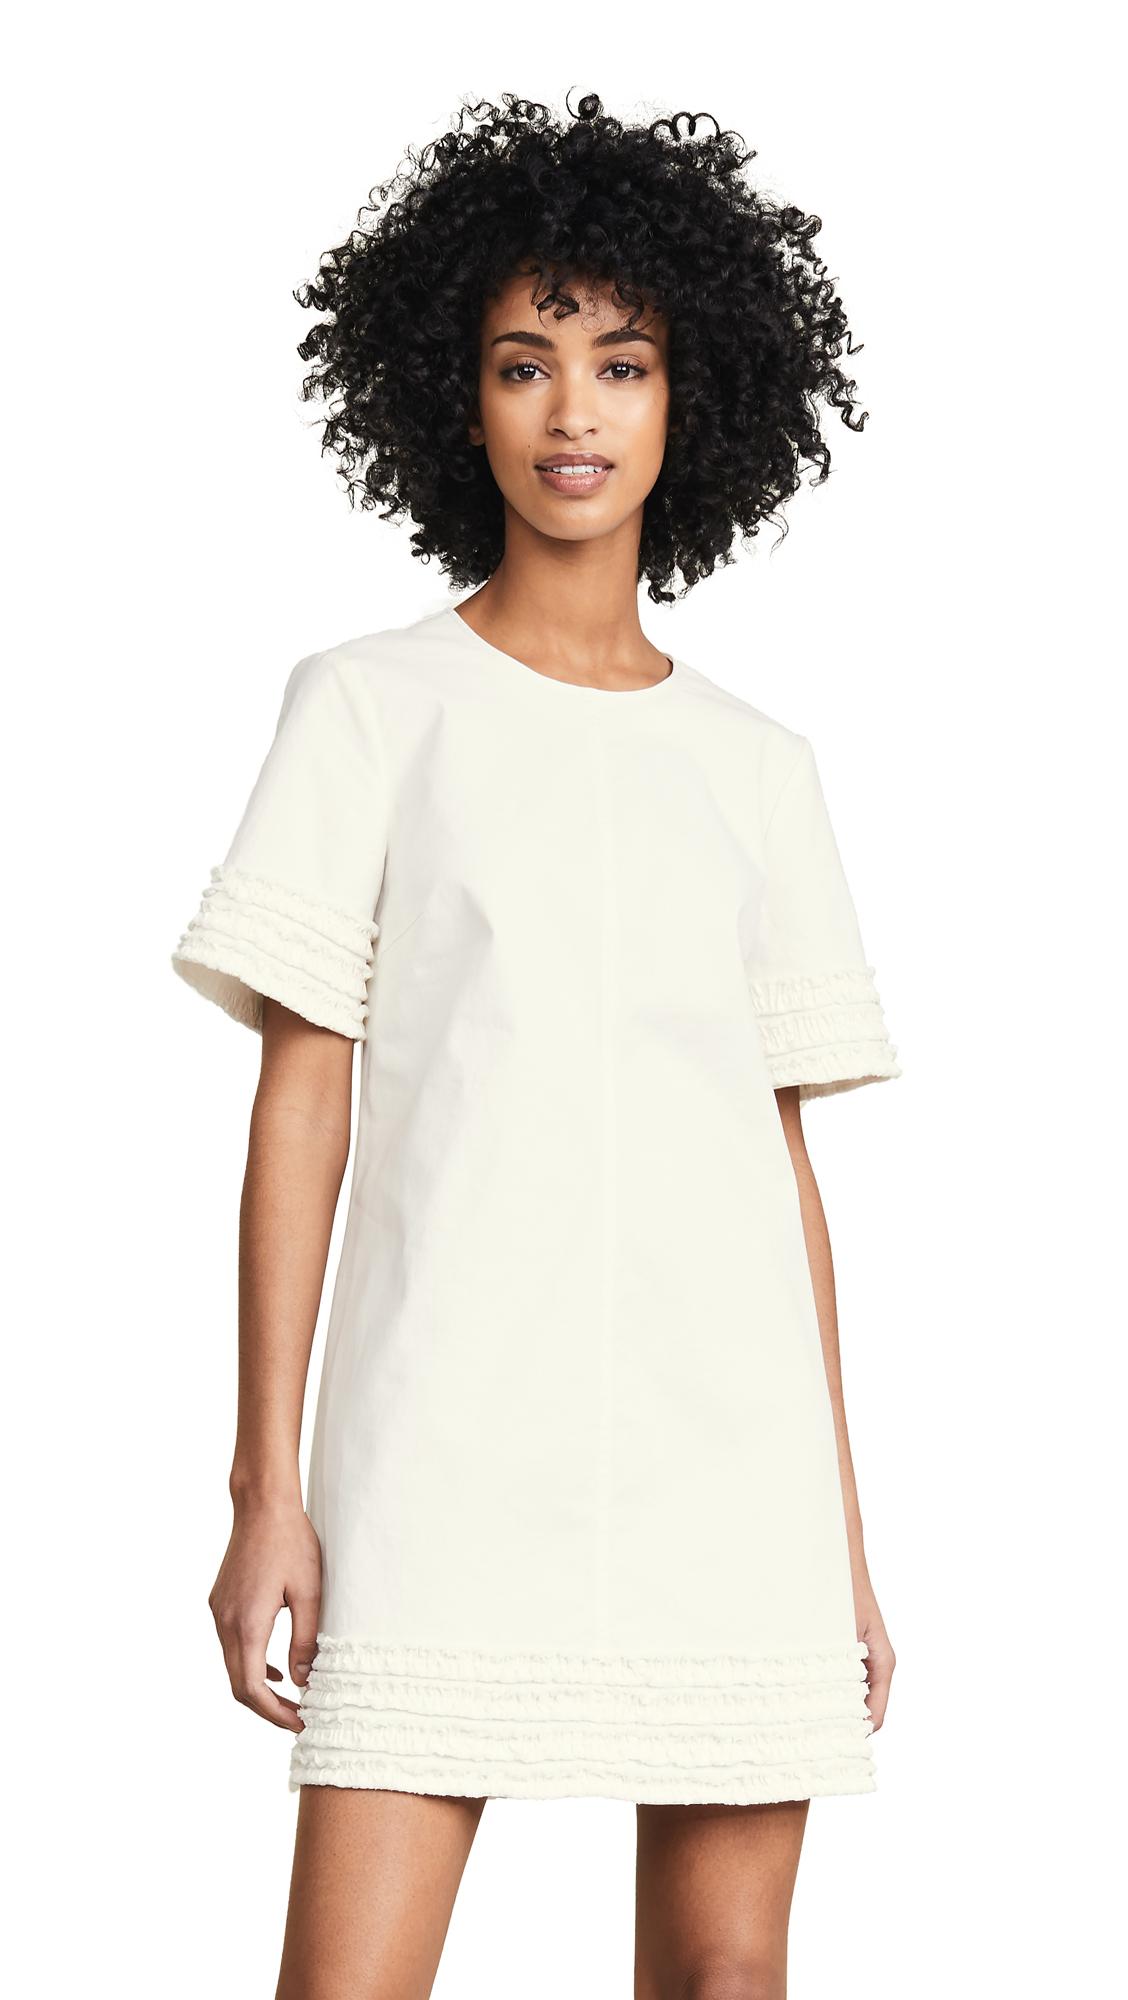 Cinq a Sept Tous Les Jours Miliitary Twill Ashton Dress - Ivory